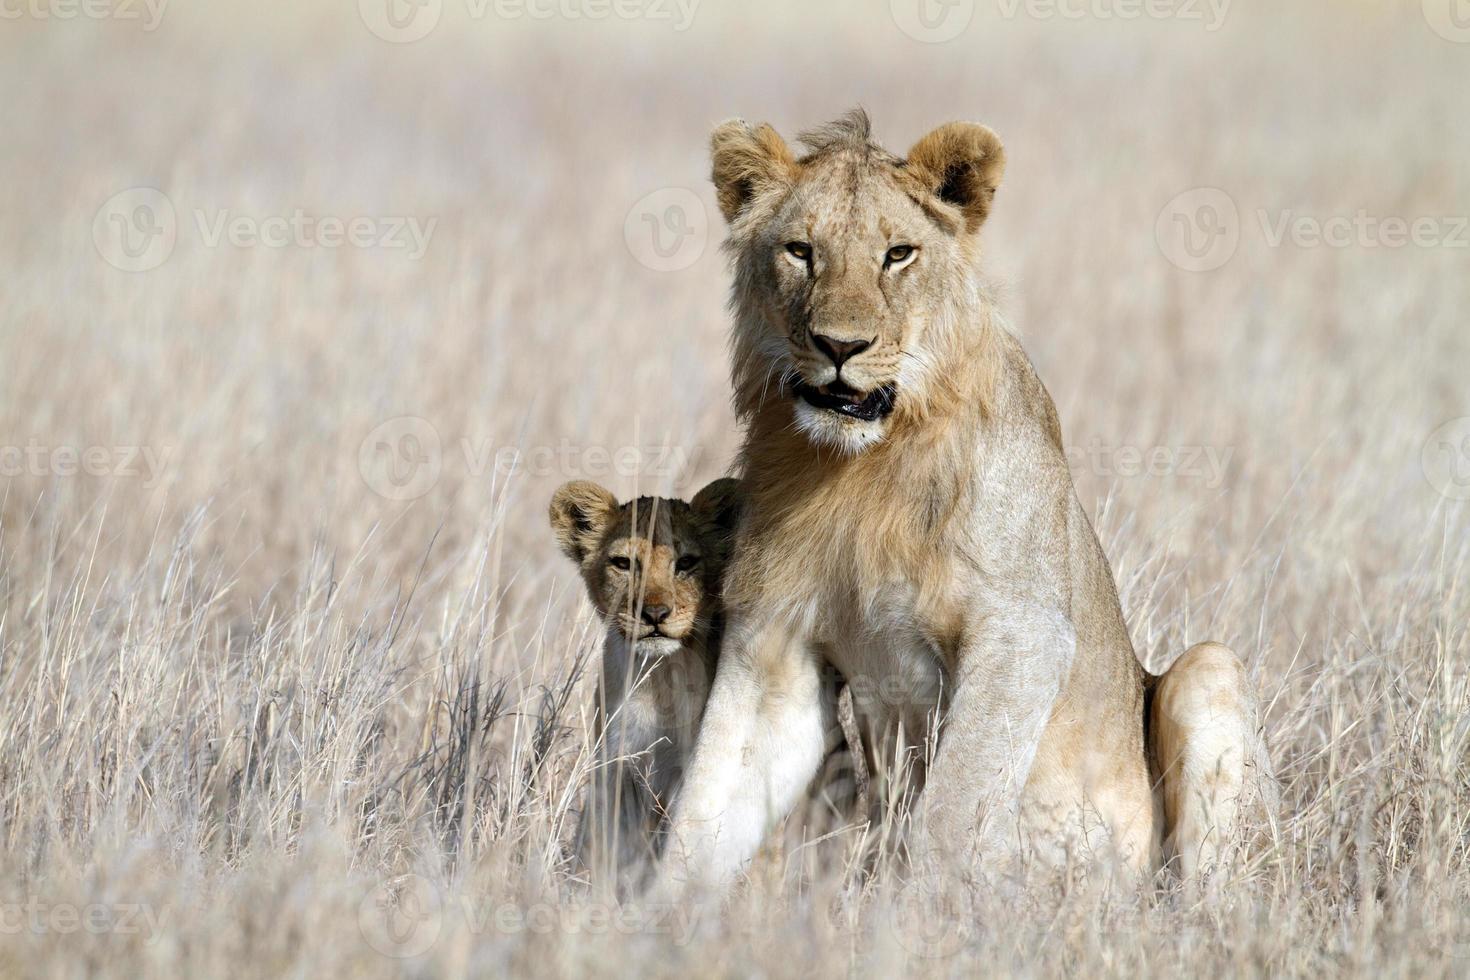 león bigbrother cachorro de niñera, serengeti, tanzania foto